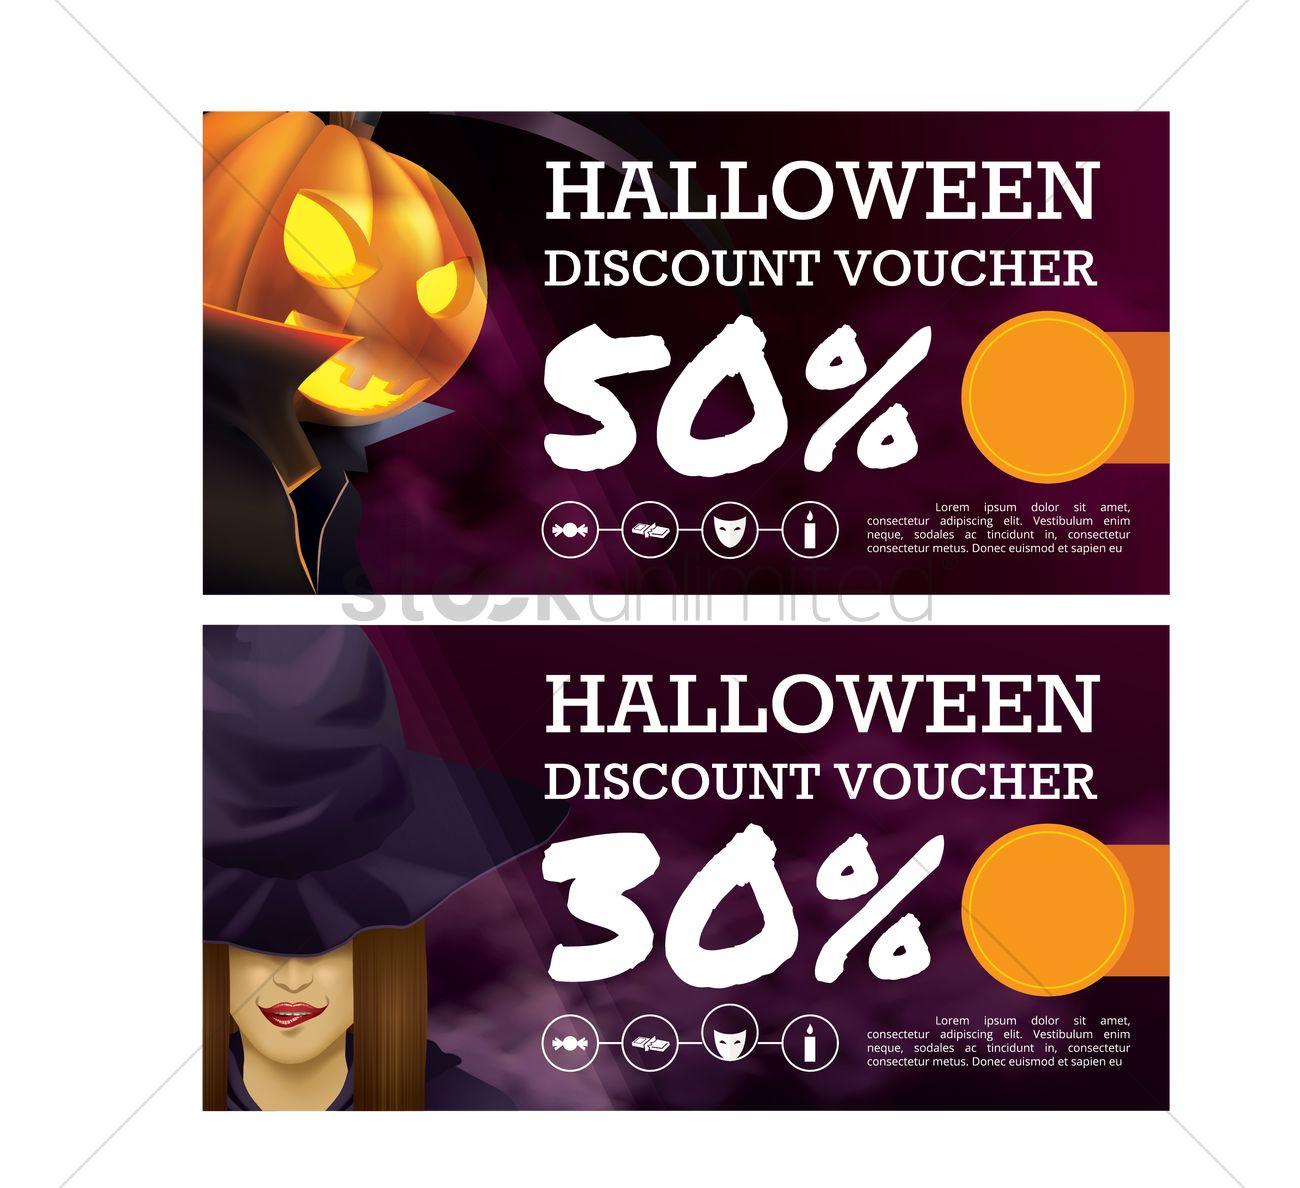 Halloween Voucher Design Vector Graphic  Discount Voucher Design